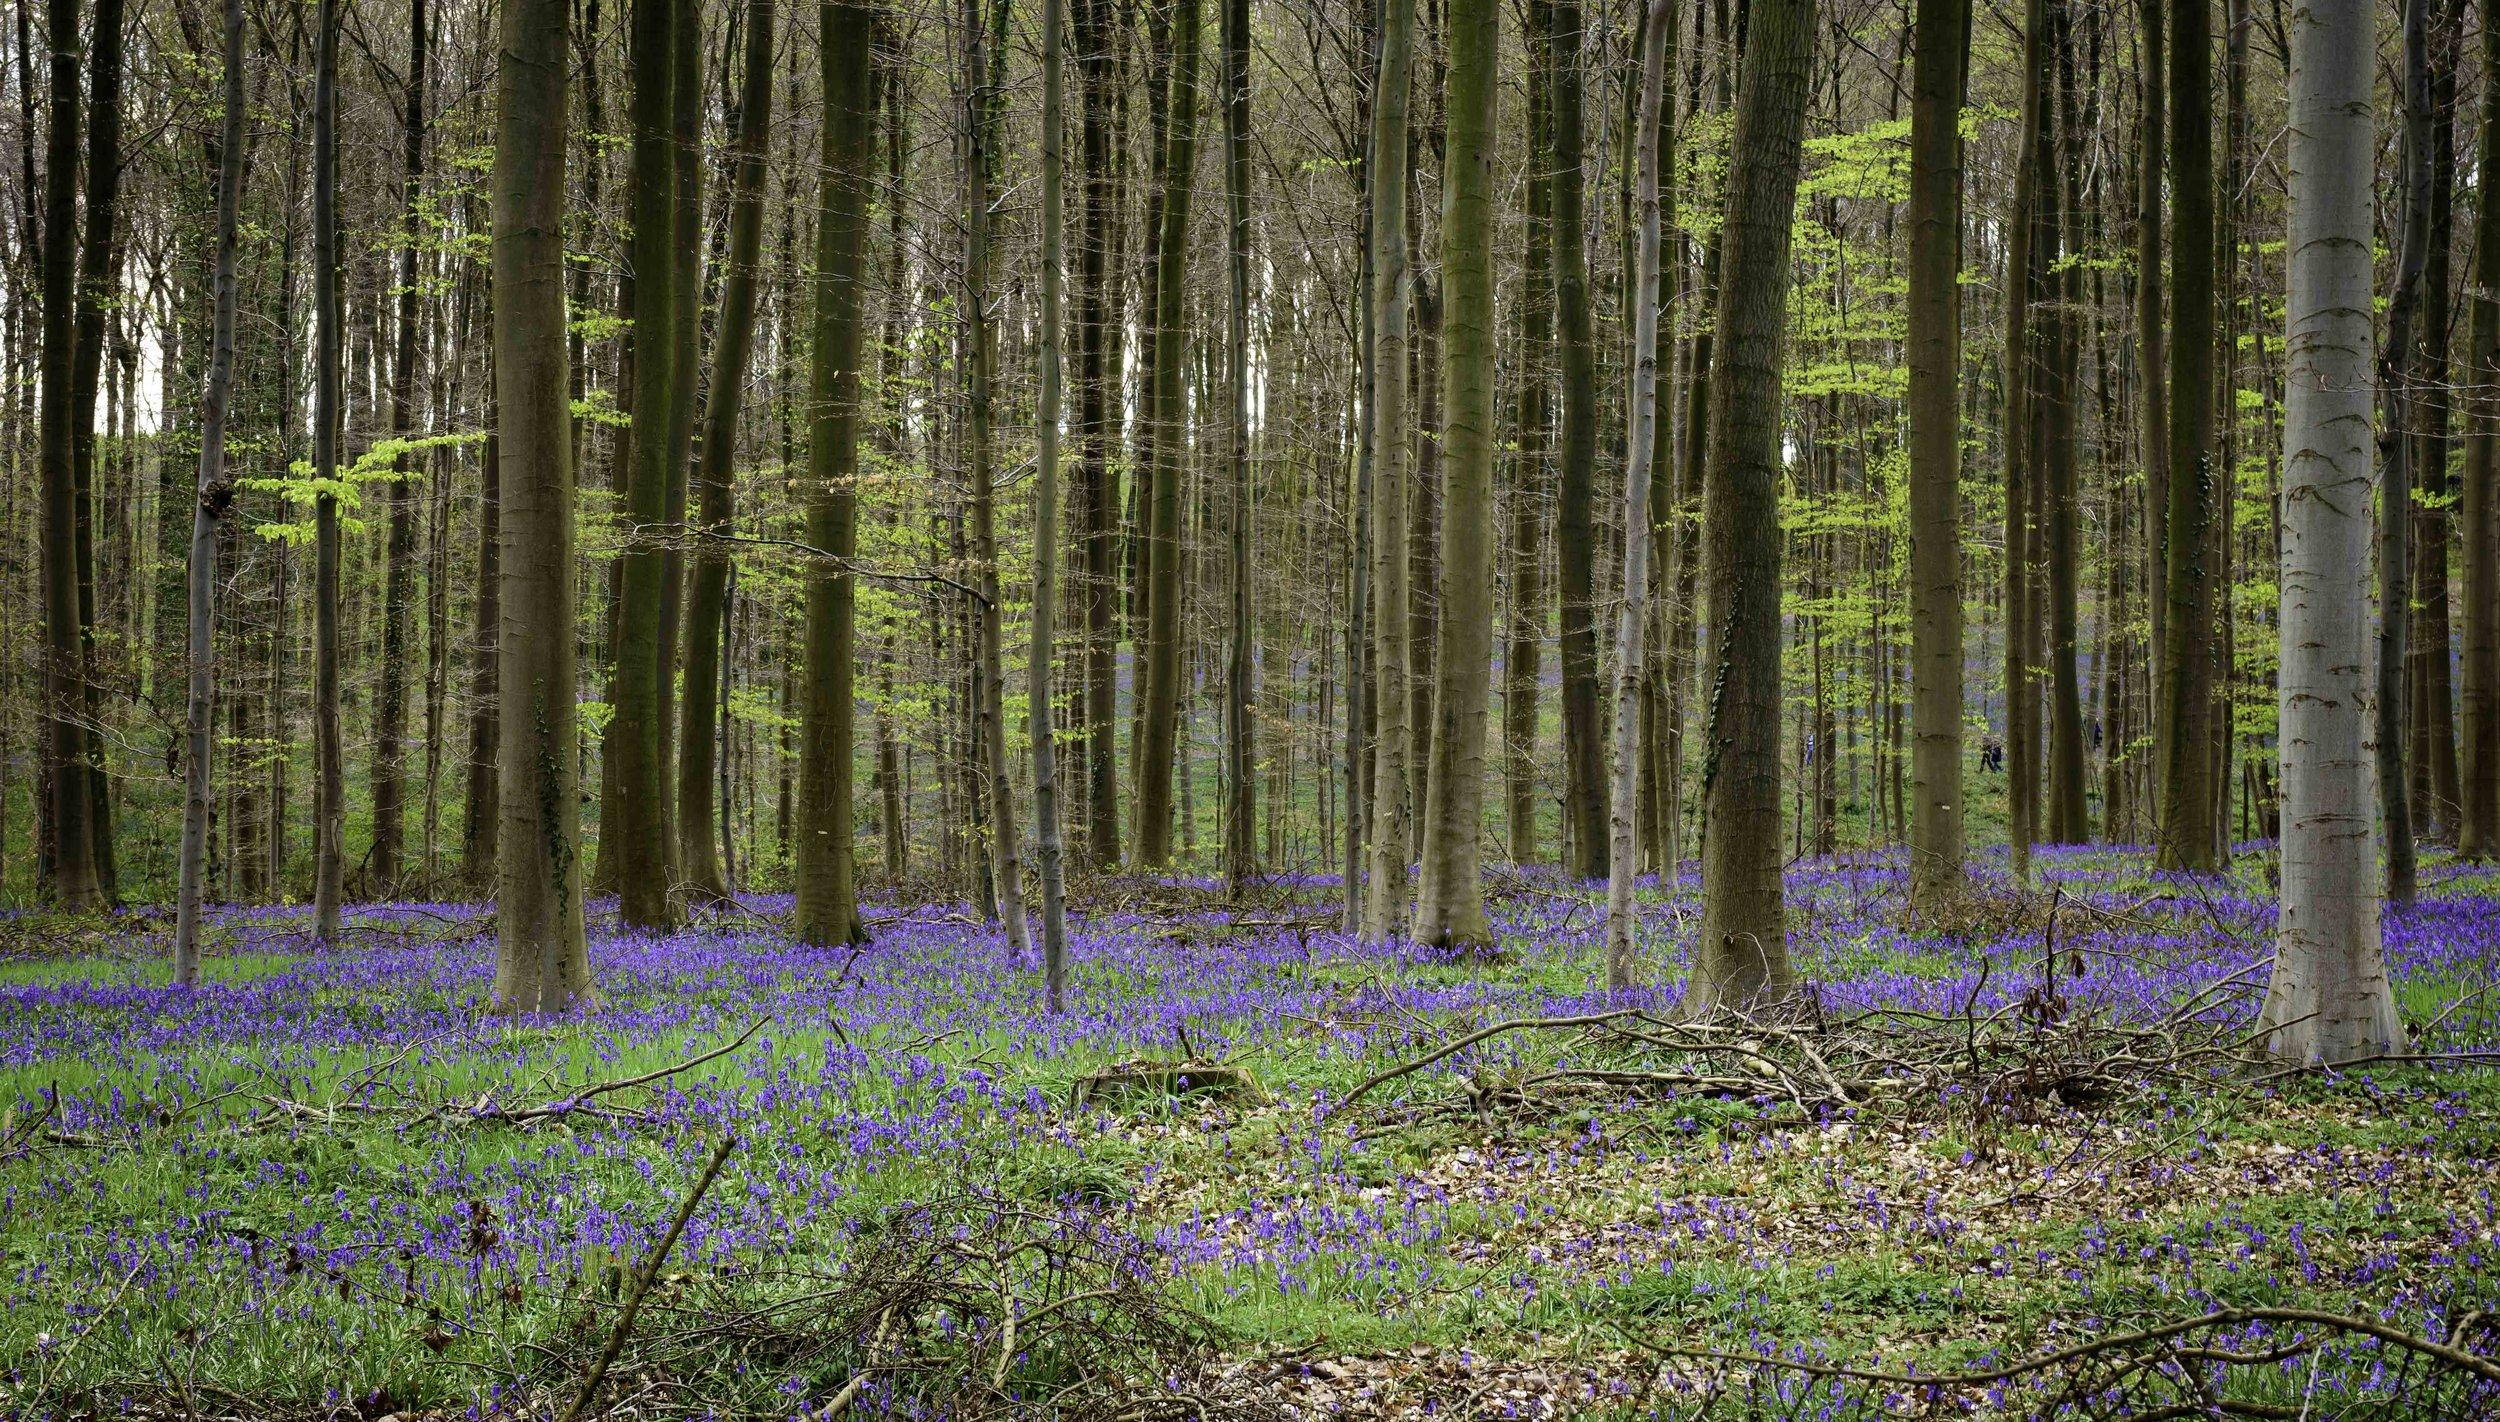 viewfinder-blauwe-hallerbos-fotograferen-tips-natuurfotografie-1